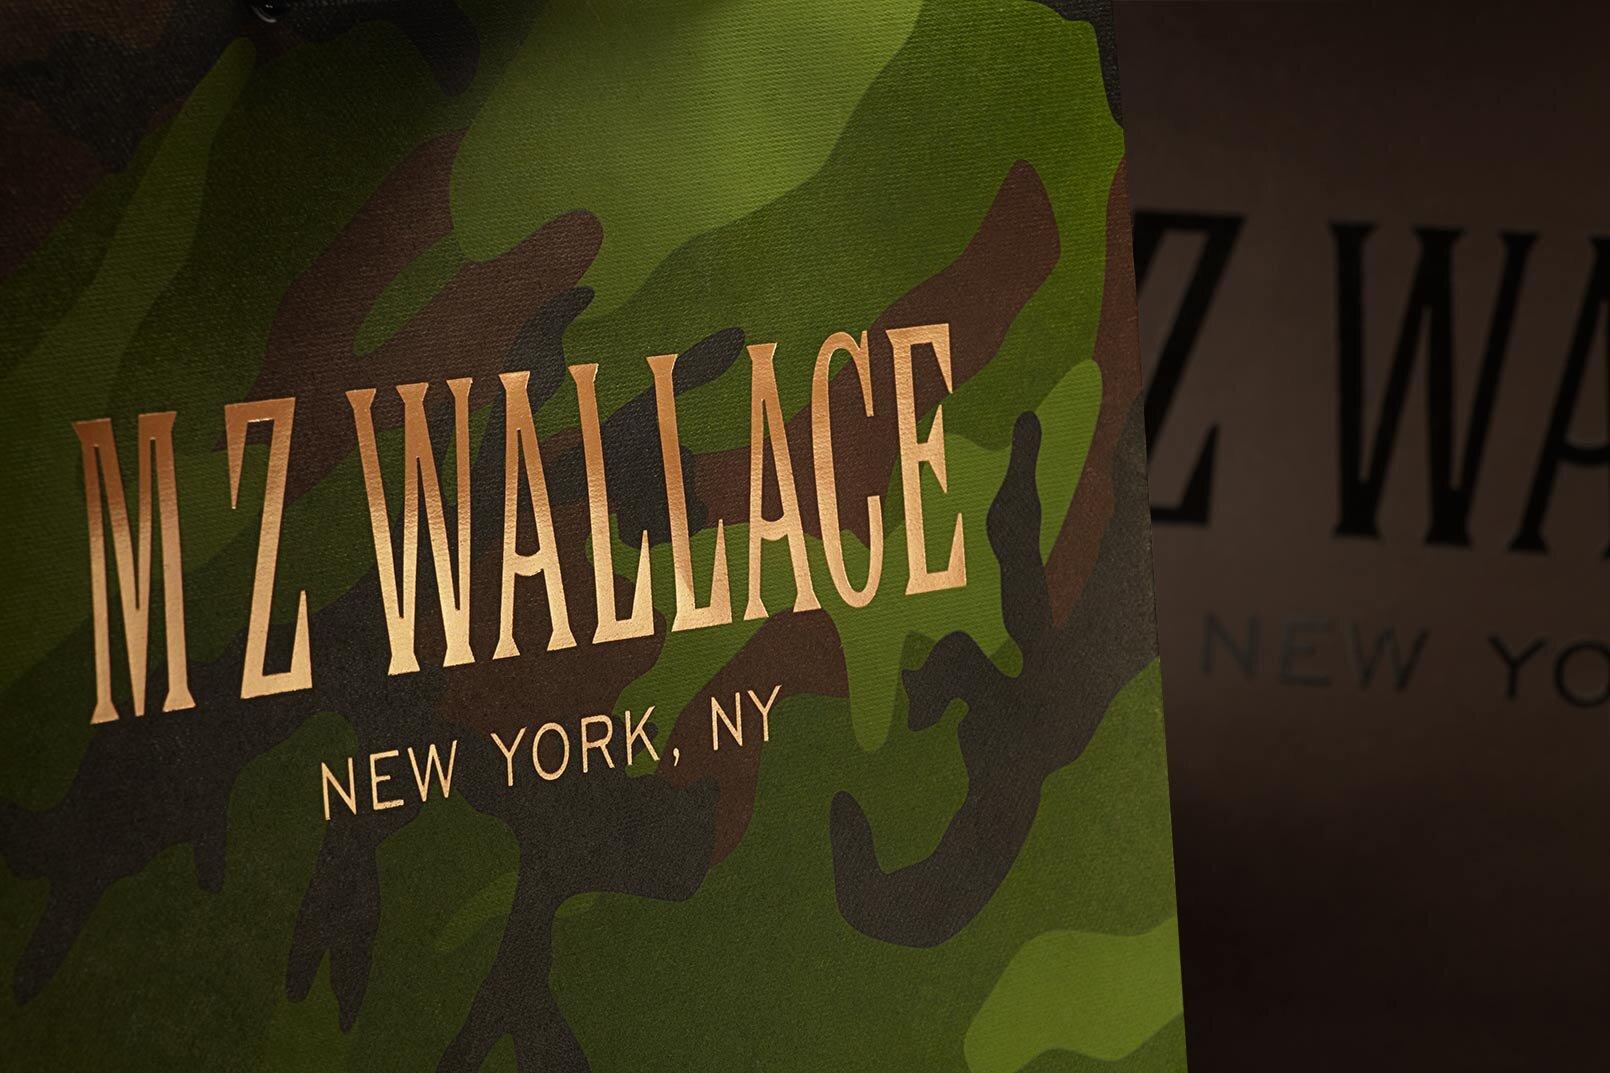 MZ-Wallace-Shopping-Bag-Design-Packaging-Company-4.JPG